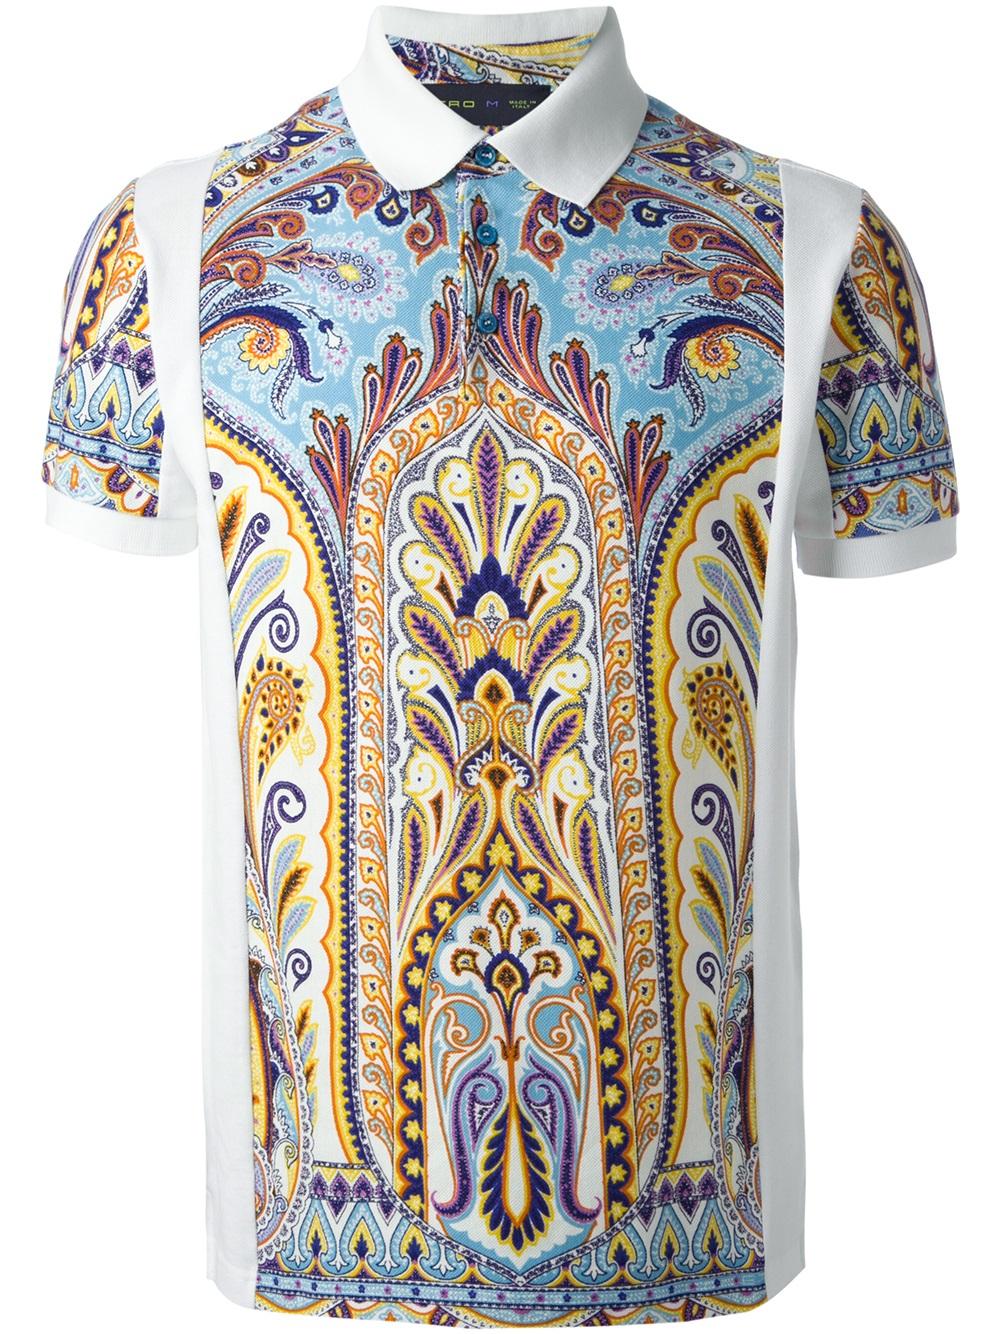 Etro largepaisleyprint sport shirt in white for men lyst for Etro men s shirts